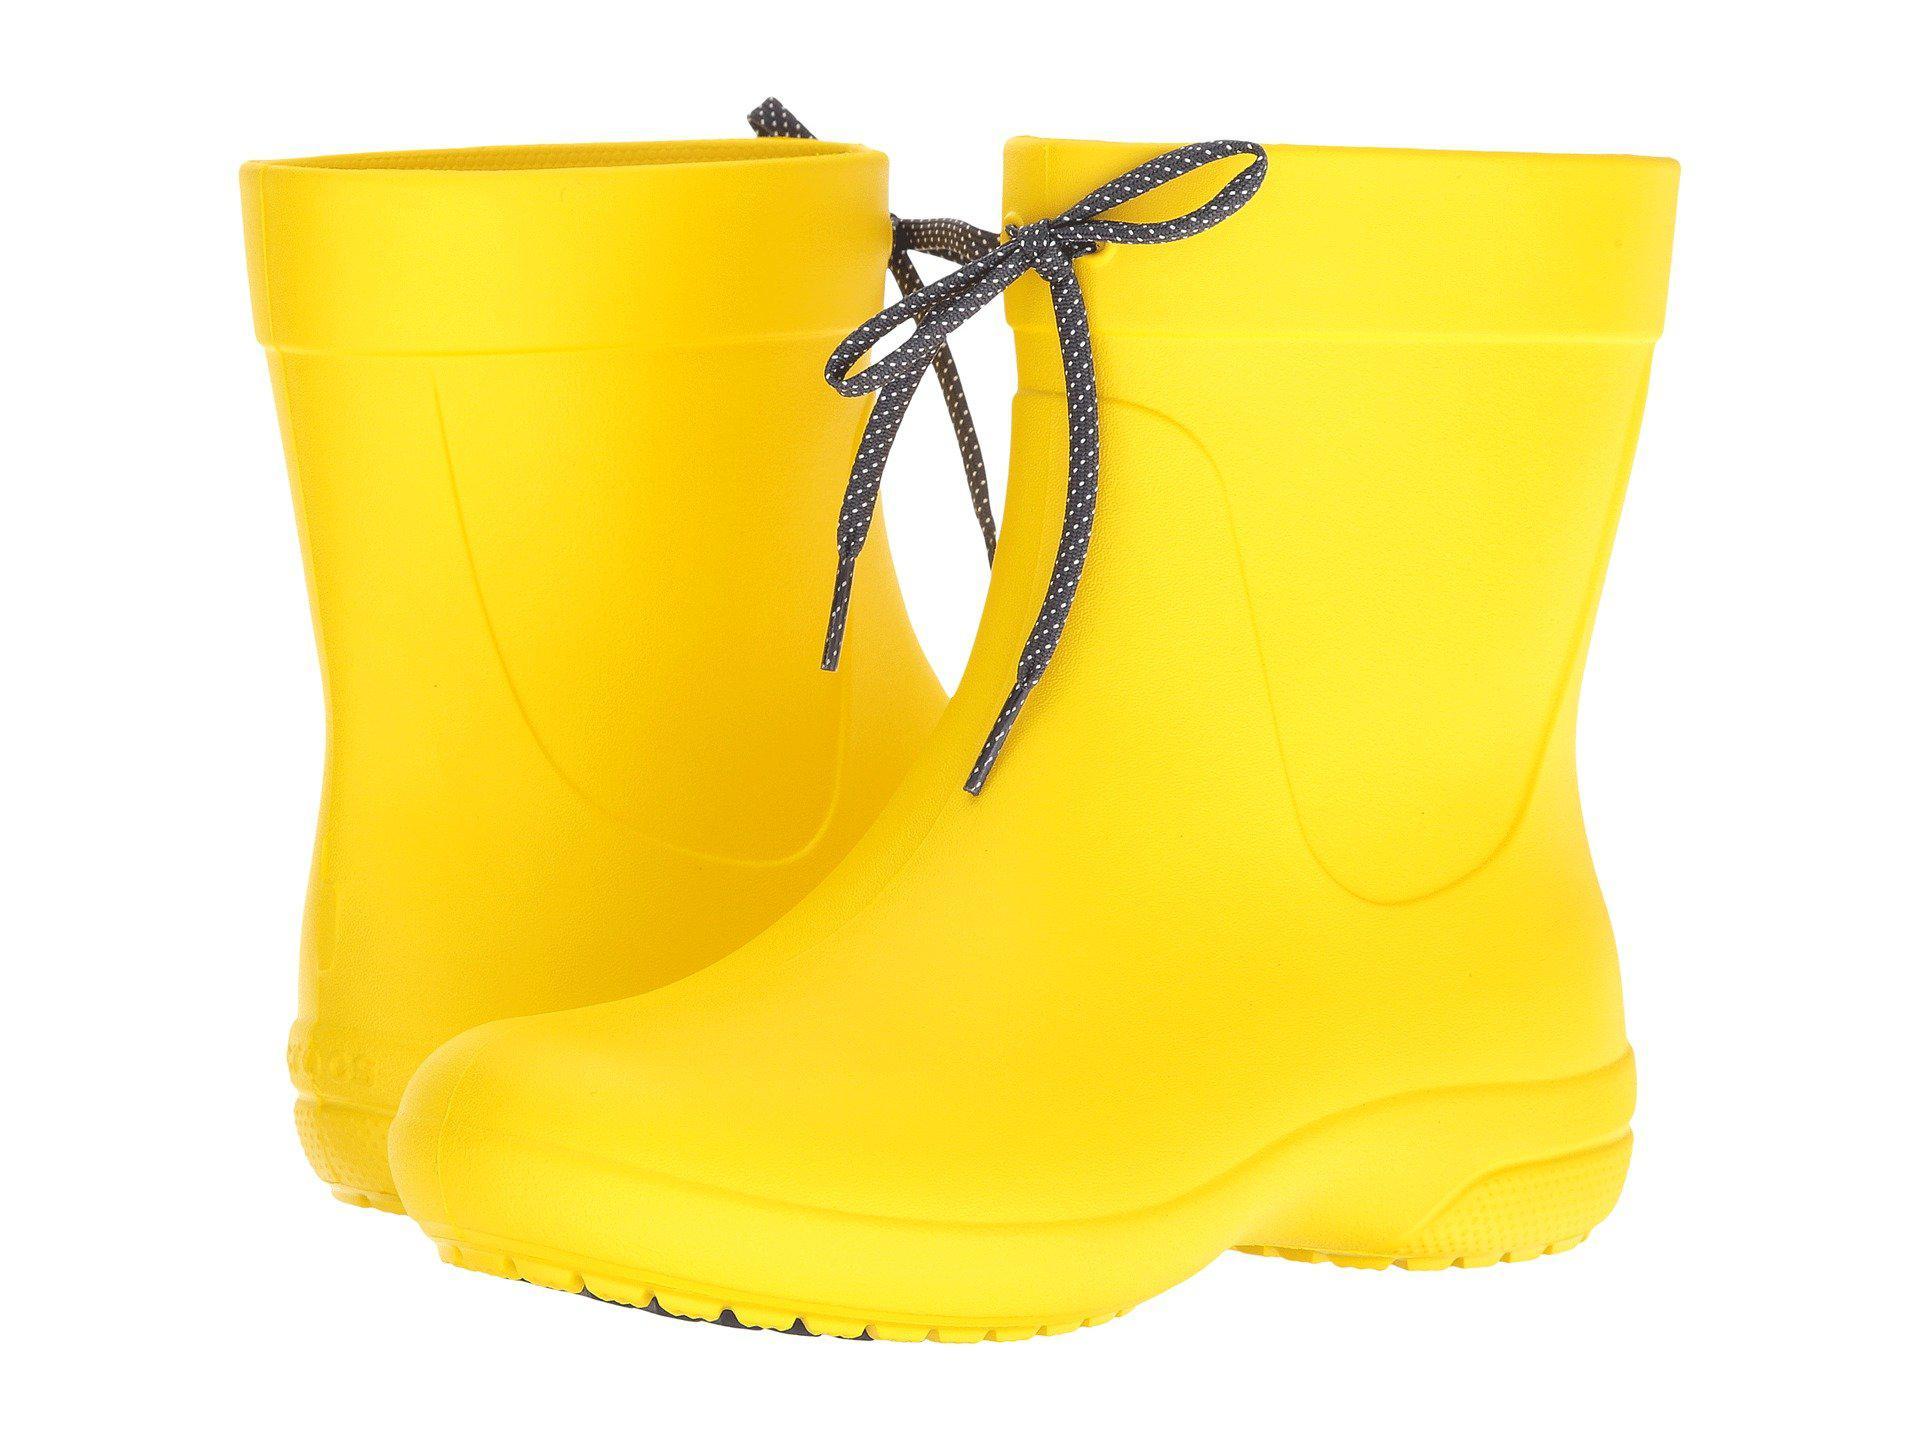 c1a9d4f0a4dd73 Lyst - Crocs™ Freesail Shorty Rainboot in Yellow